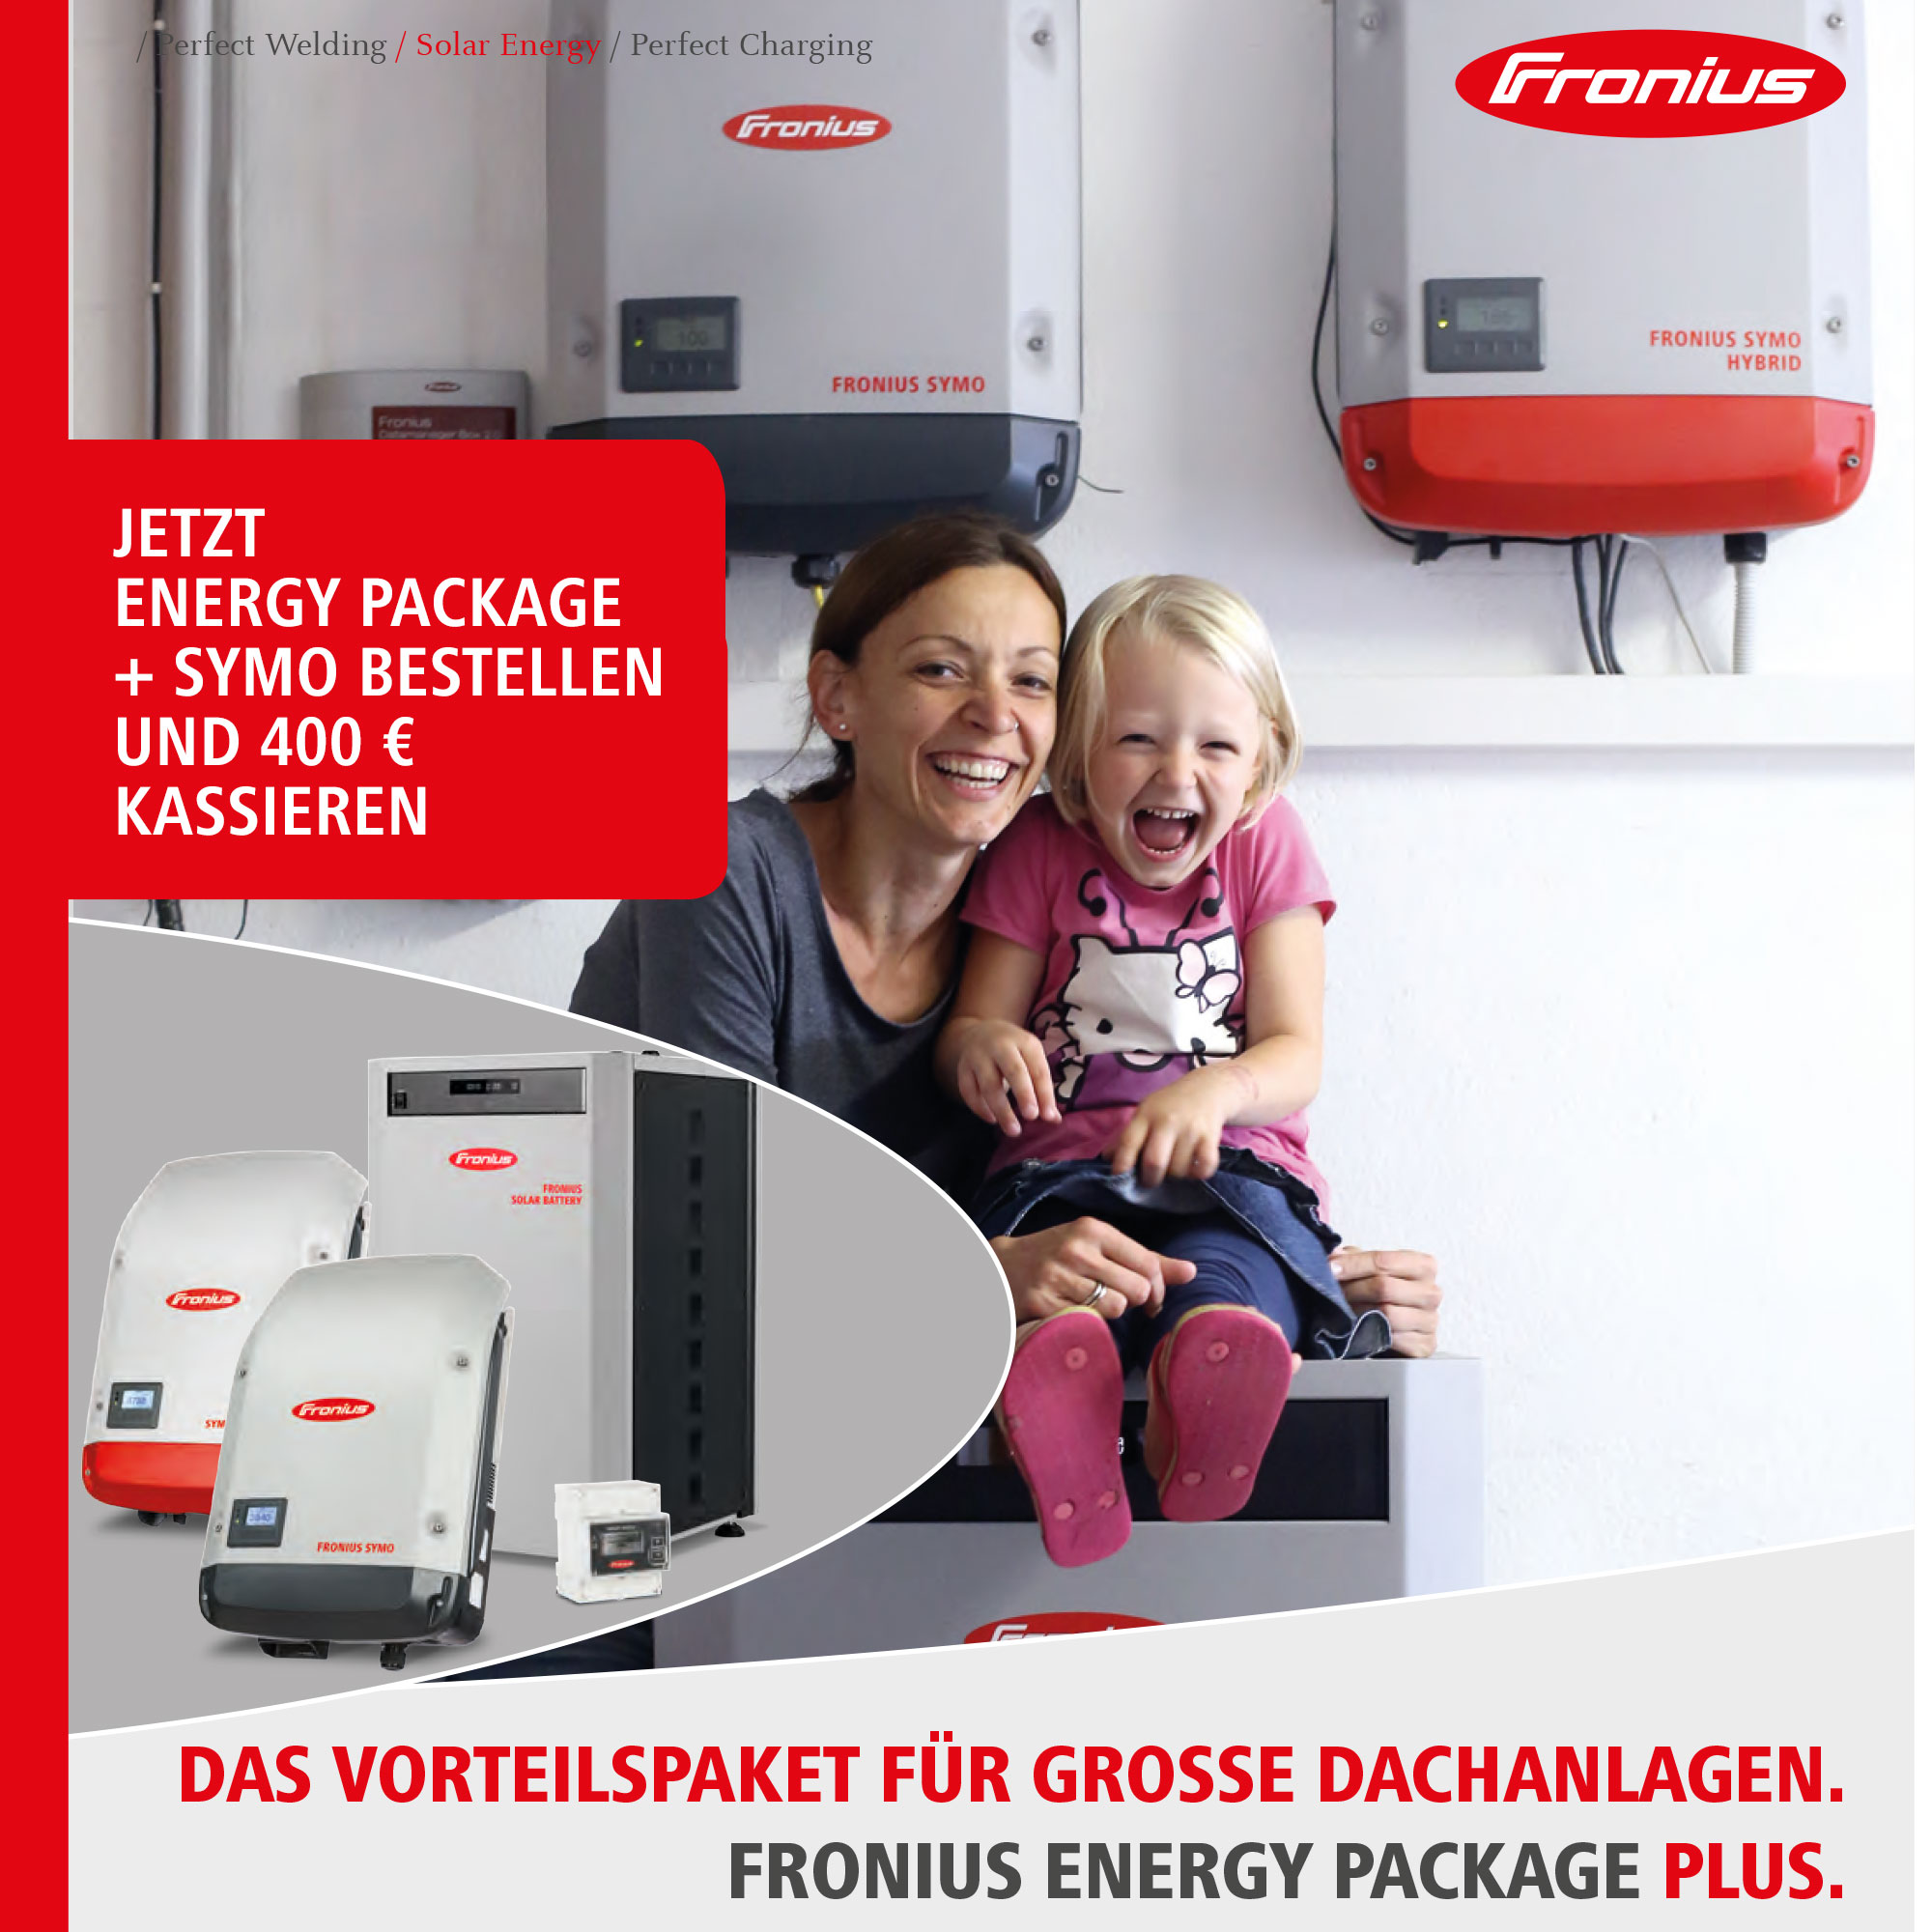 Fronius Energy Package Plus 400€ Aktion